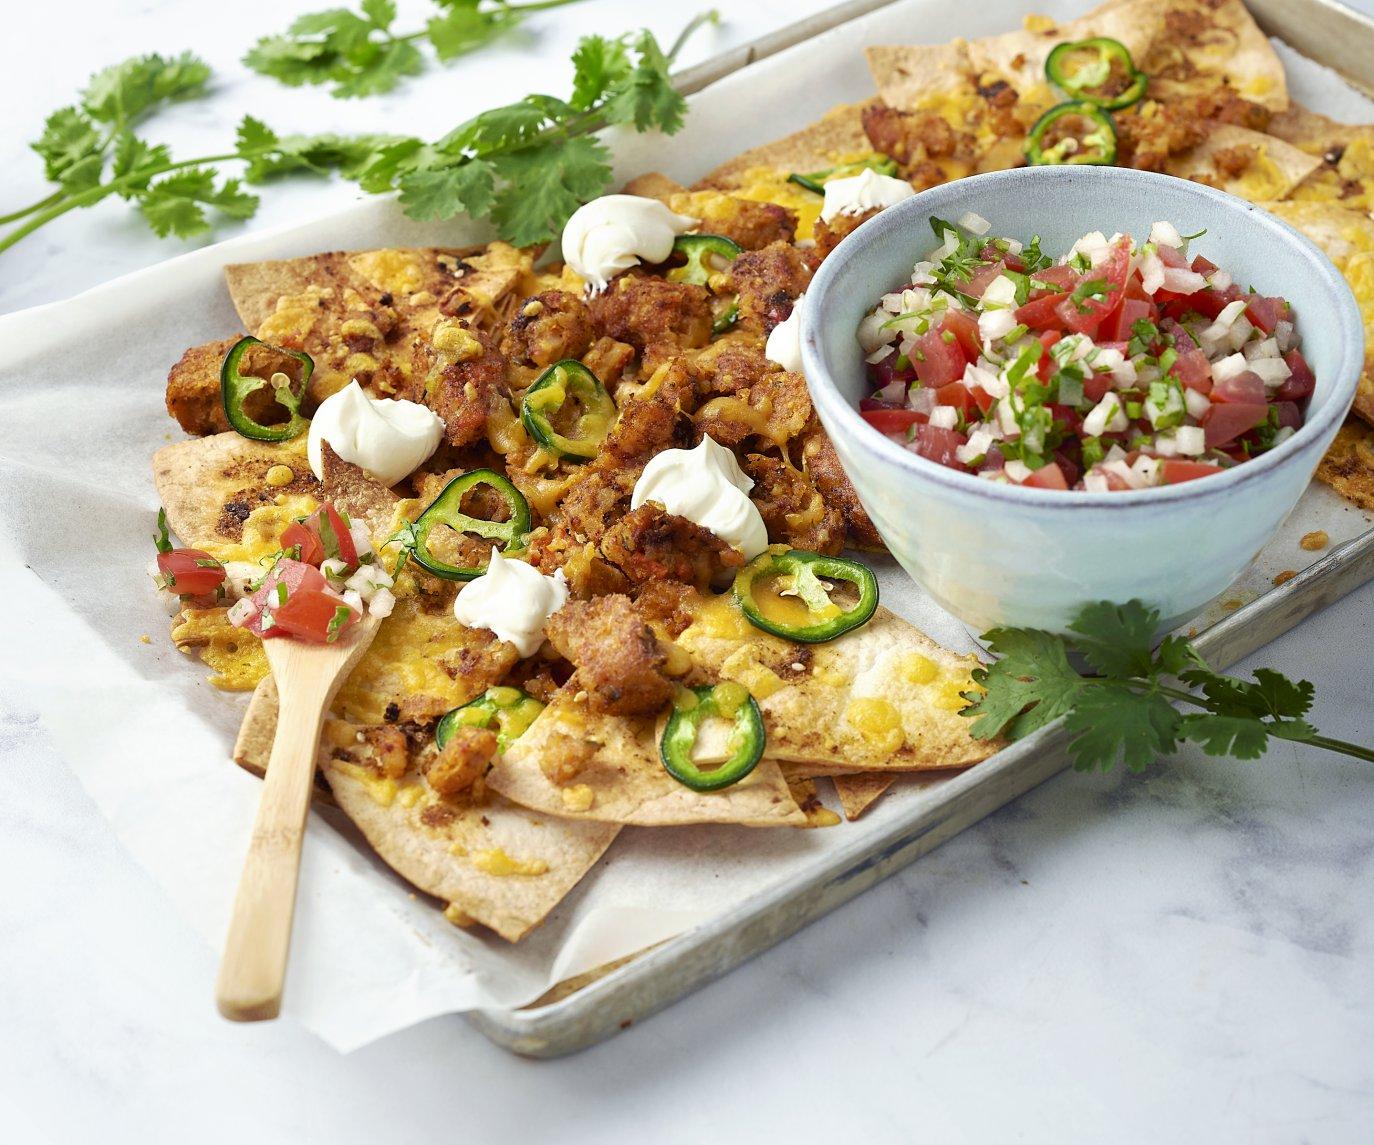 Veggie loaded nachos